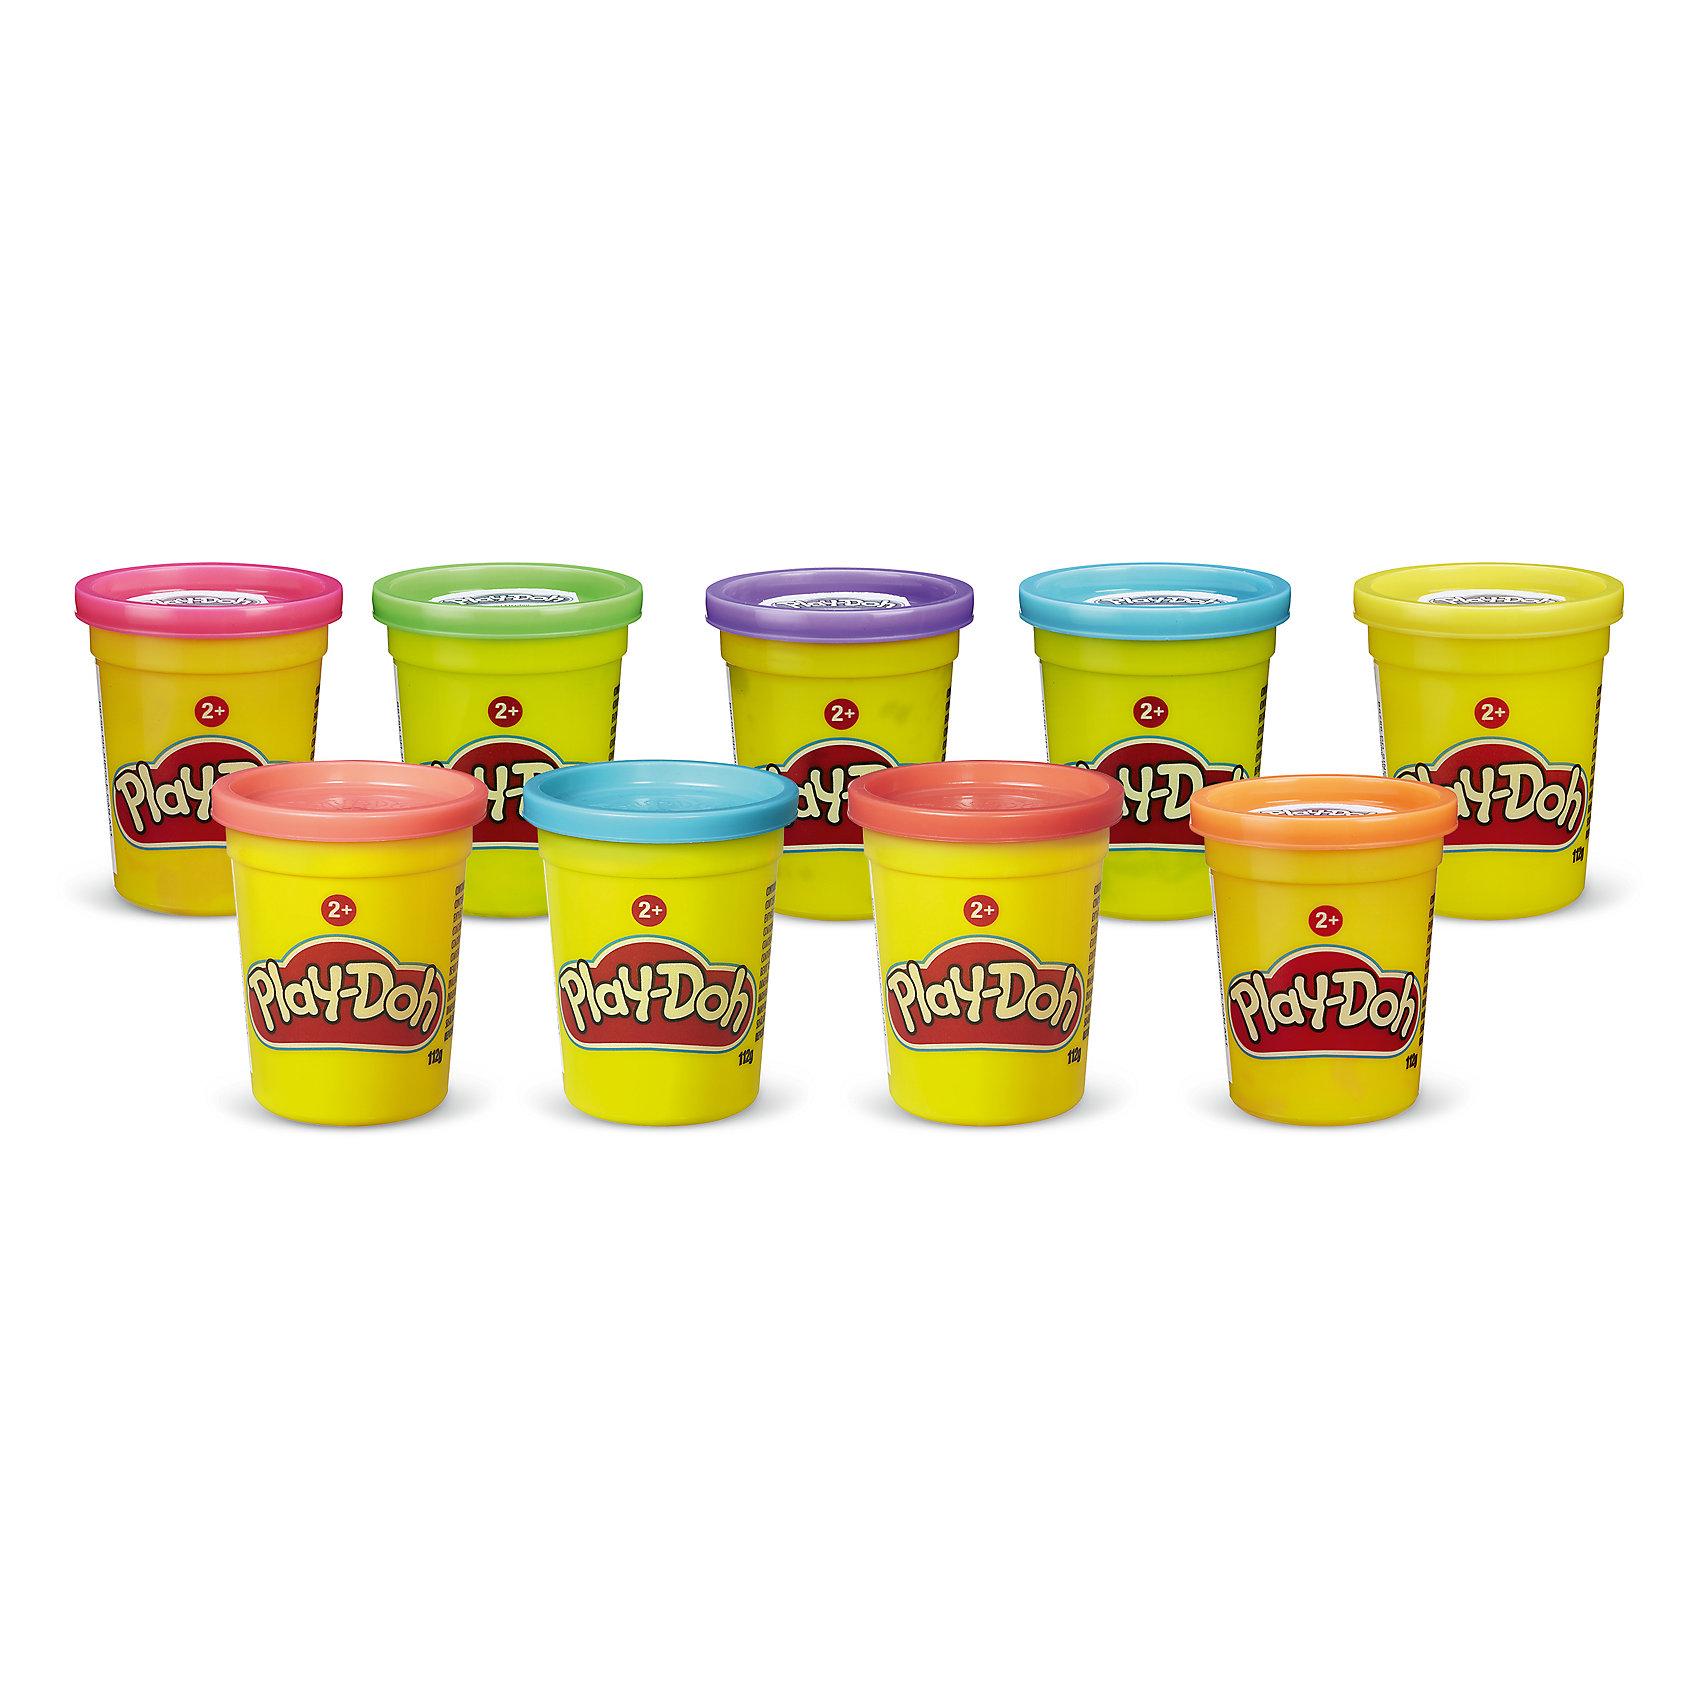 Hasbro Play-Doh Пластилин 1 банка play doh b6756 пластилин 1 банка 112 гр в ассорт фиол розов оранж голуб желт